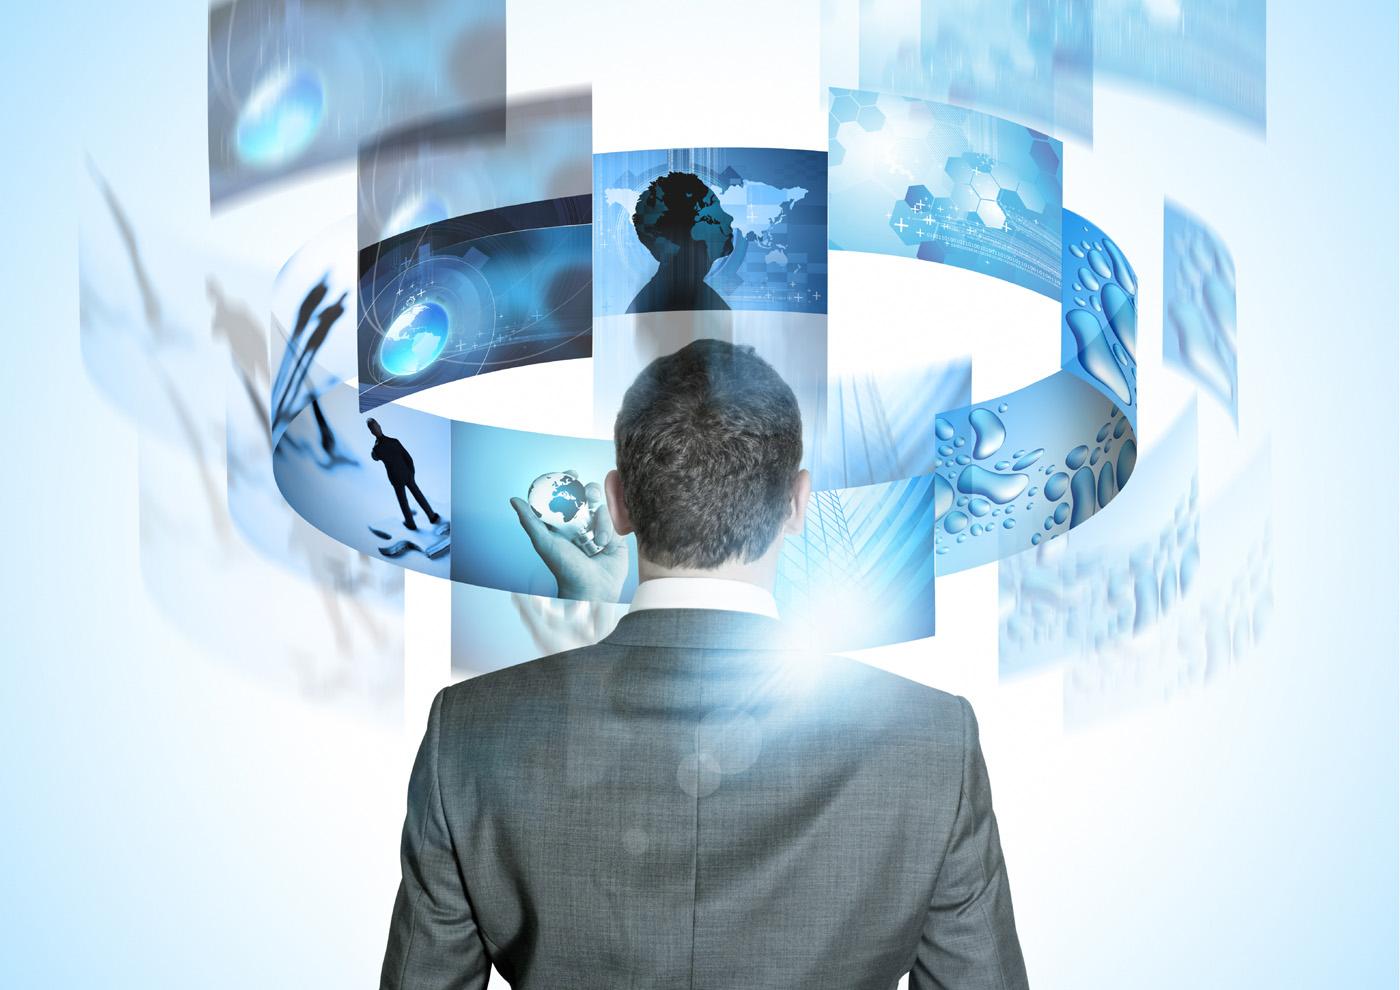 A tecnologia para fundir o cérebro humano e inteligência artificial já está sendo desenvolvida